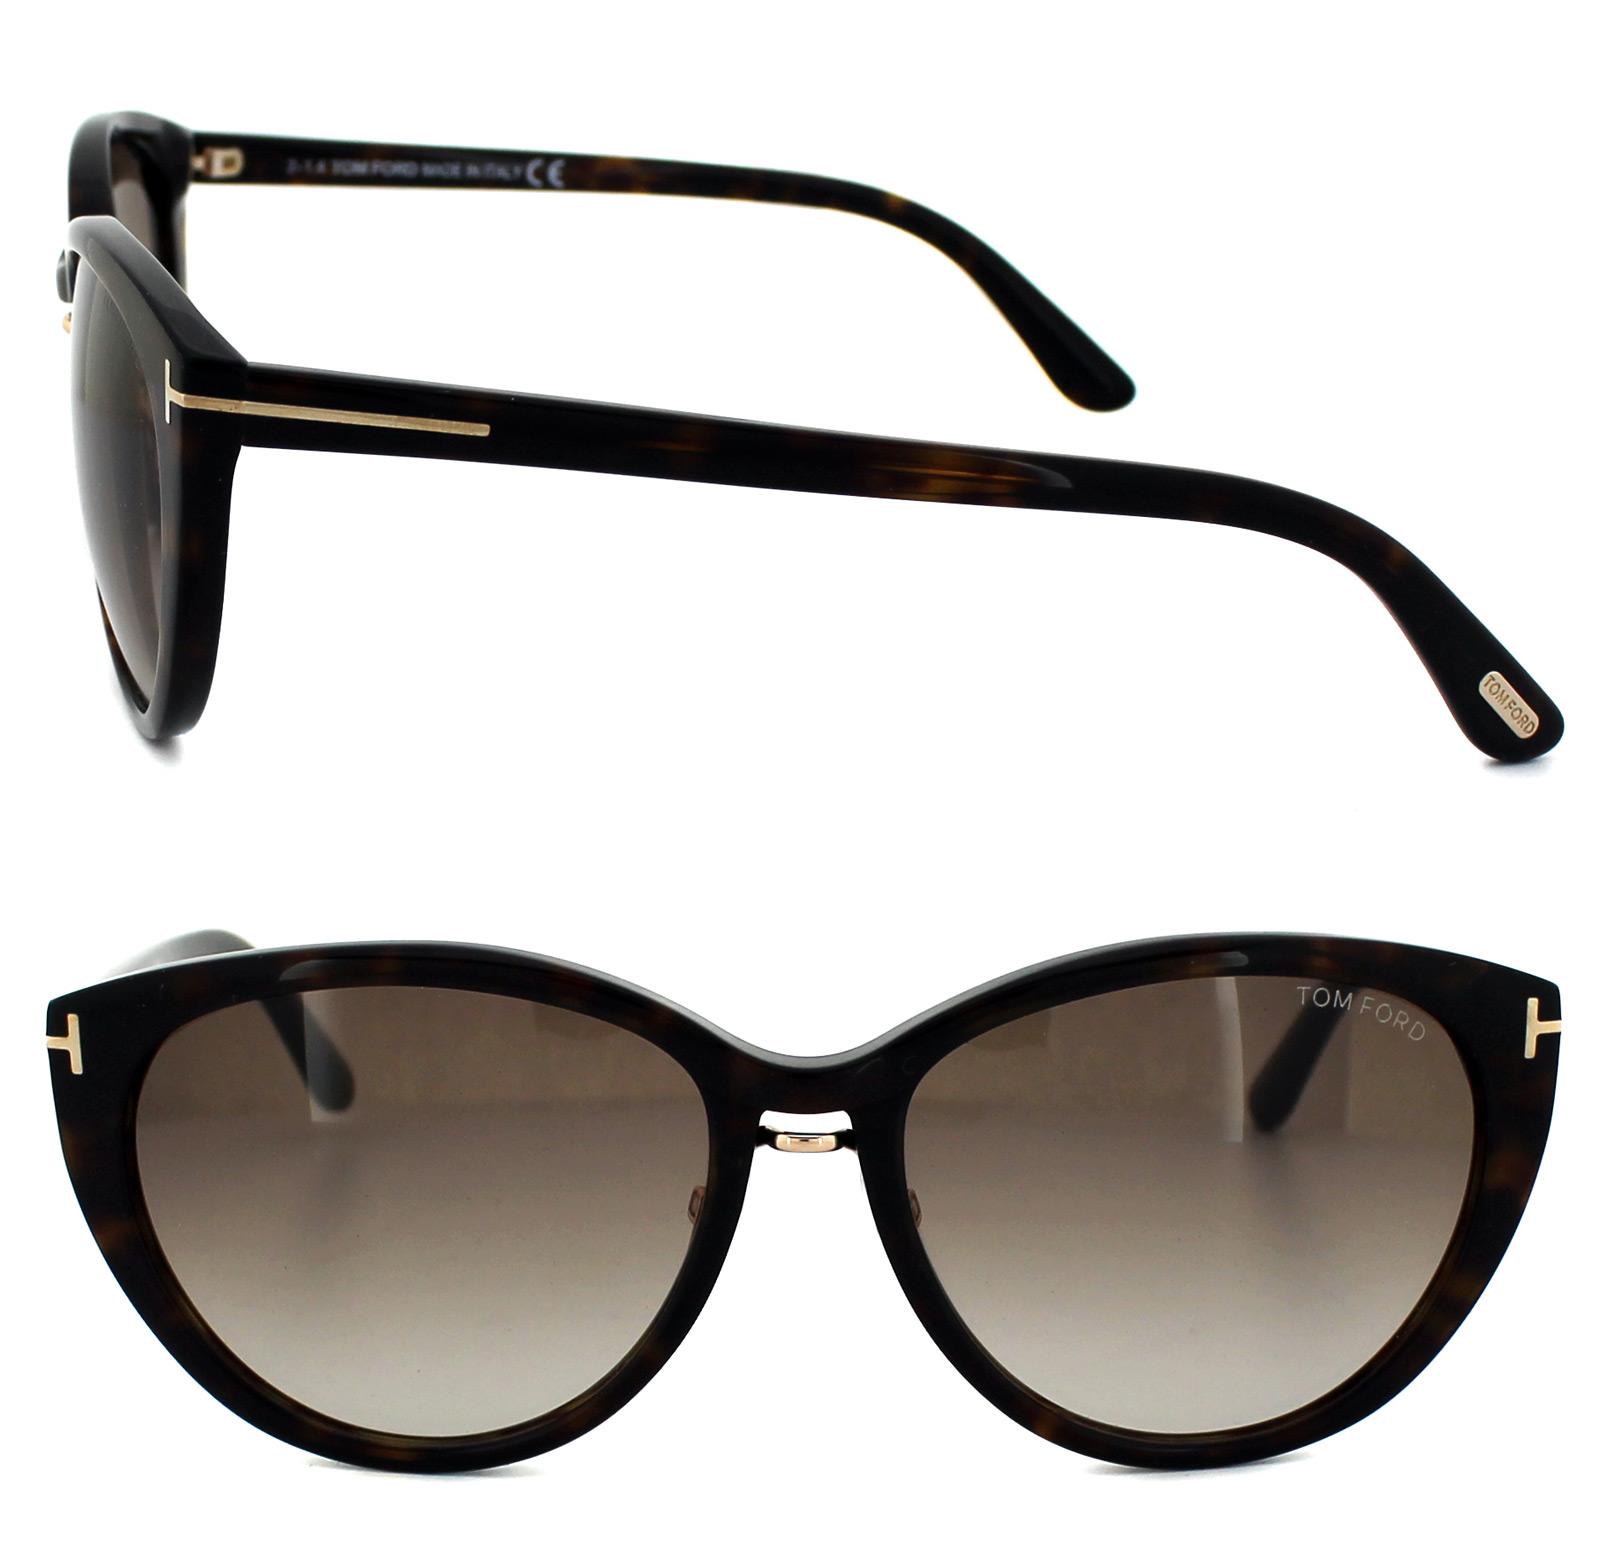 9b185a5749a3 Cheap Tom Ford 0345 Gina Sunglasses - Discounted Sunglasses